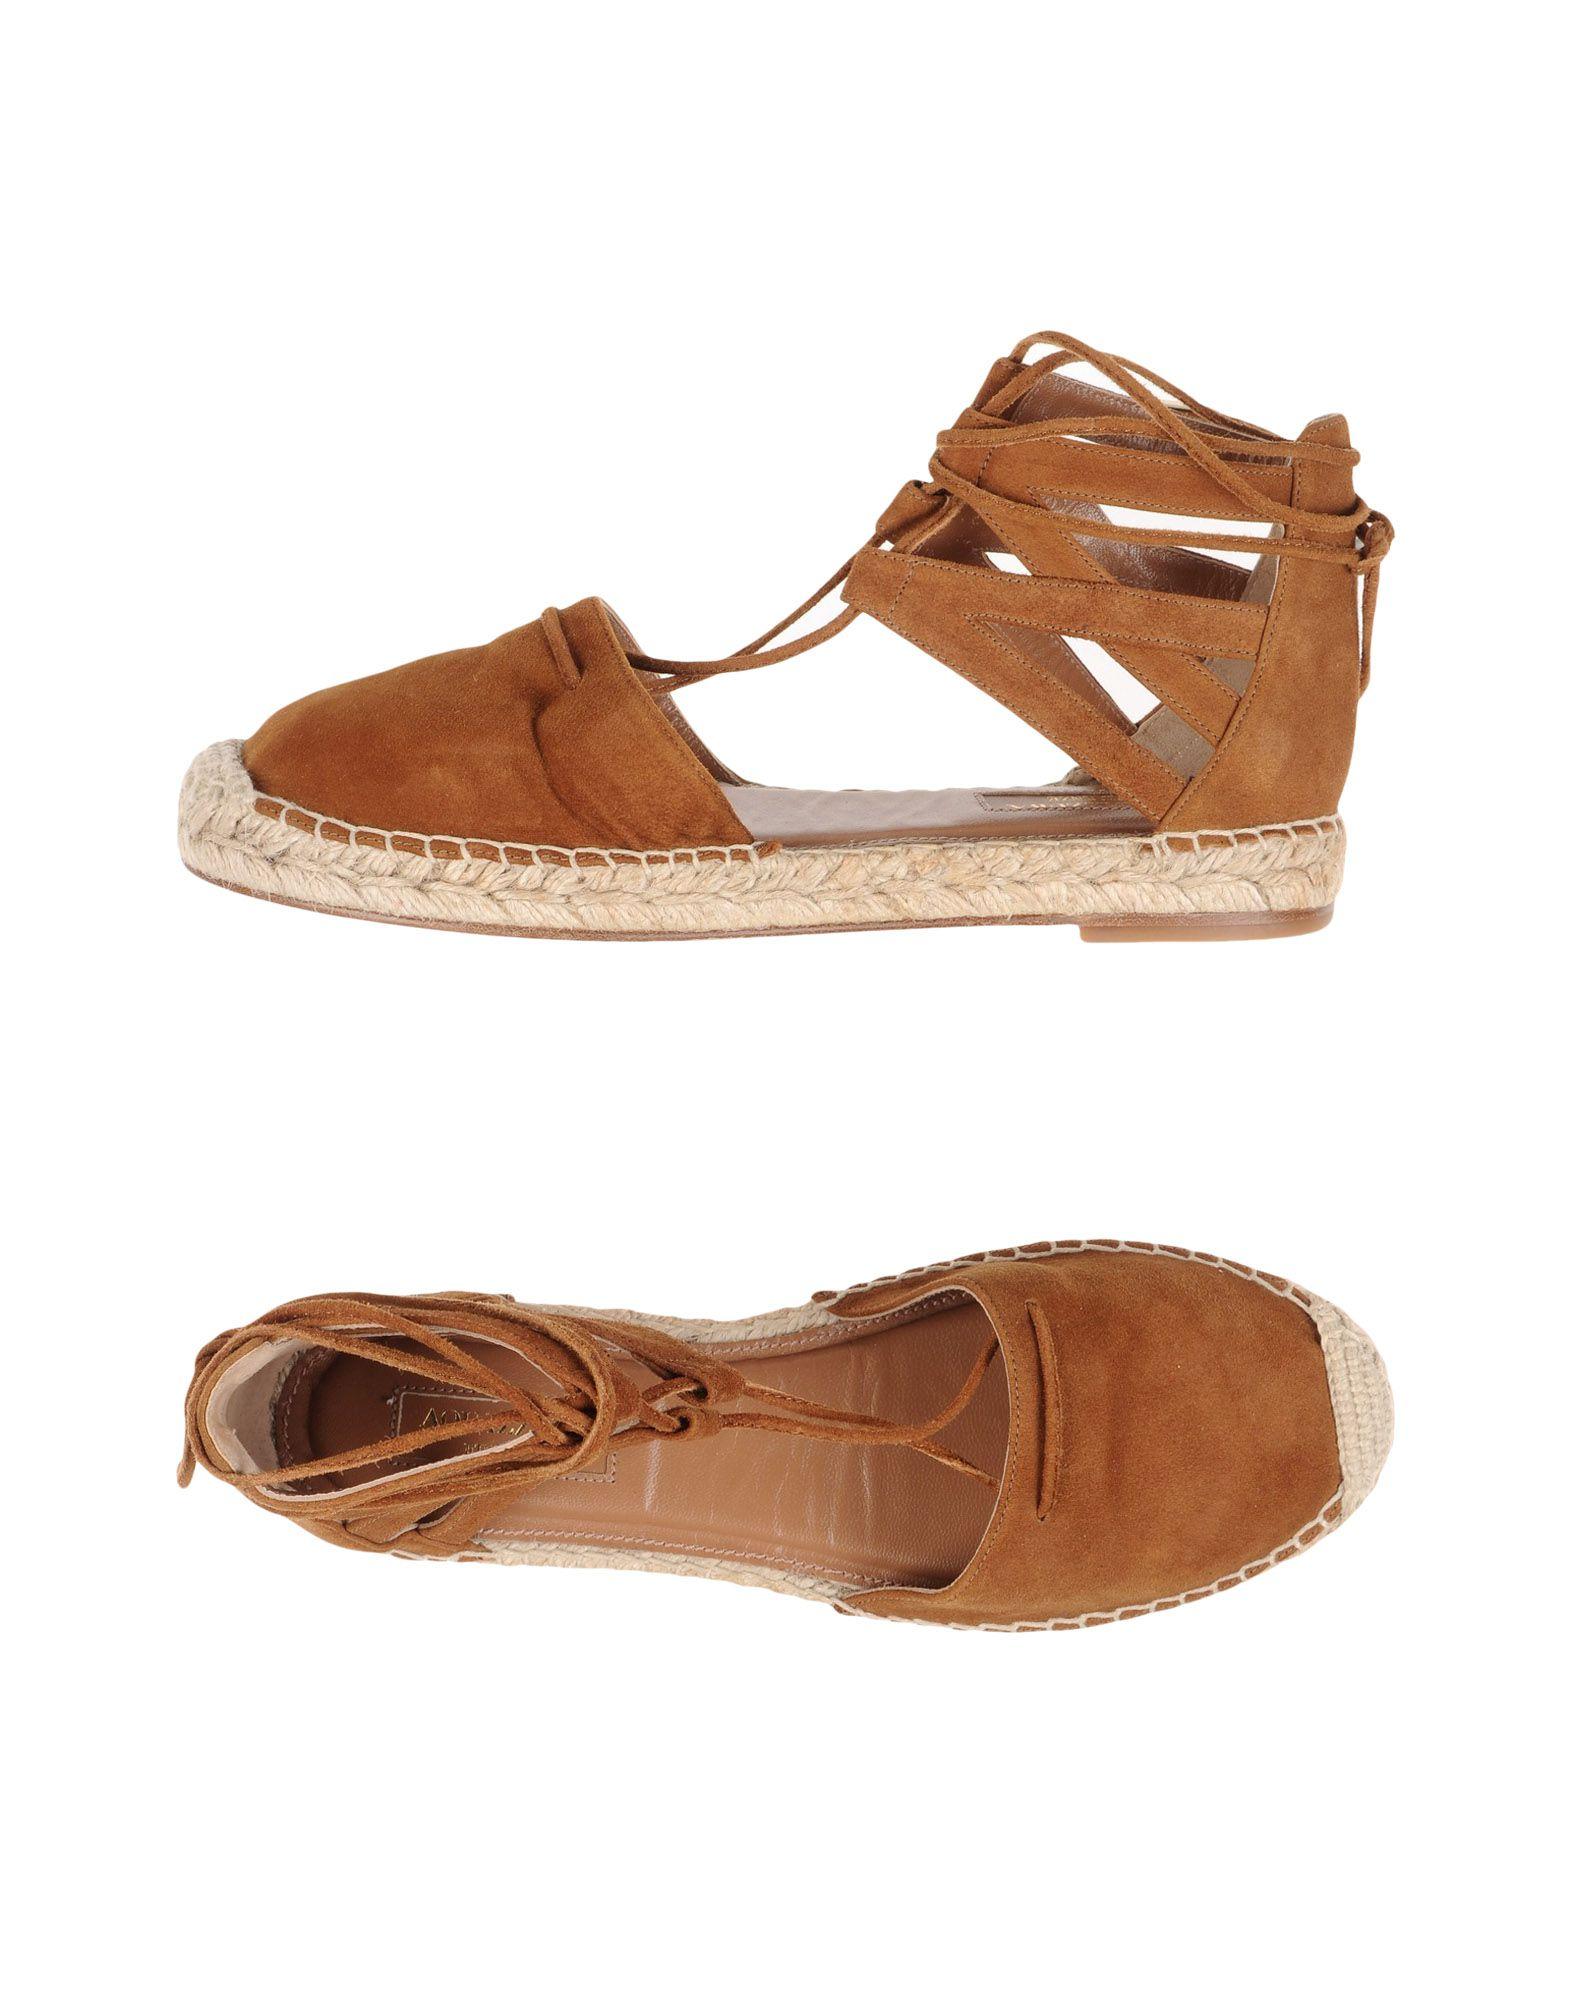 Aquazzura Espadrilles Damen  11158740KVGut aussehende strapazierfähige Schuhe